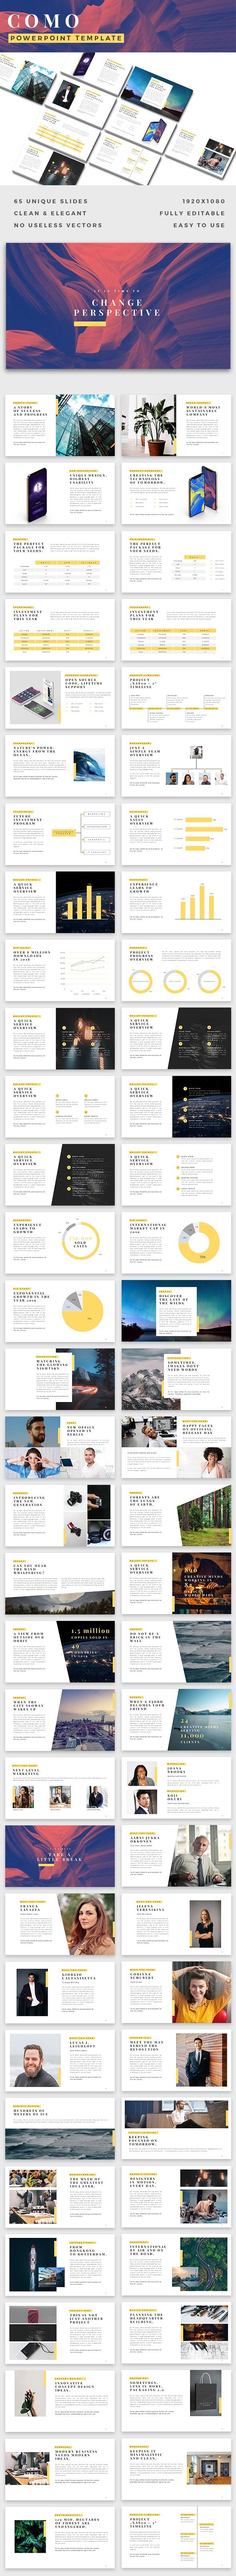 Como Premium Powerpoint Template - PowerPoint Templates Presentation Templates